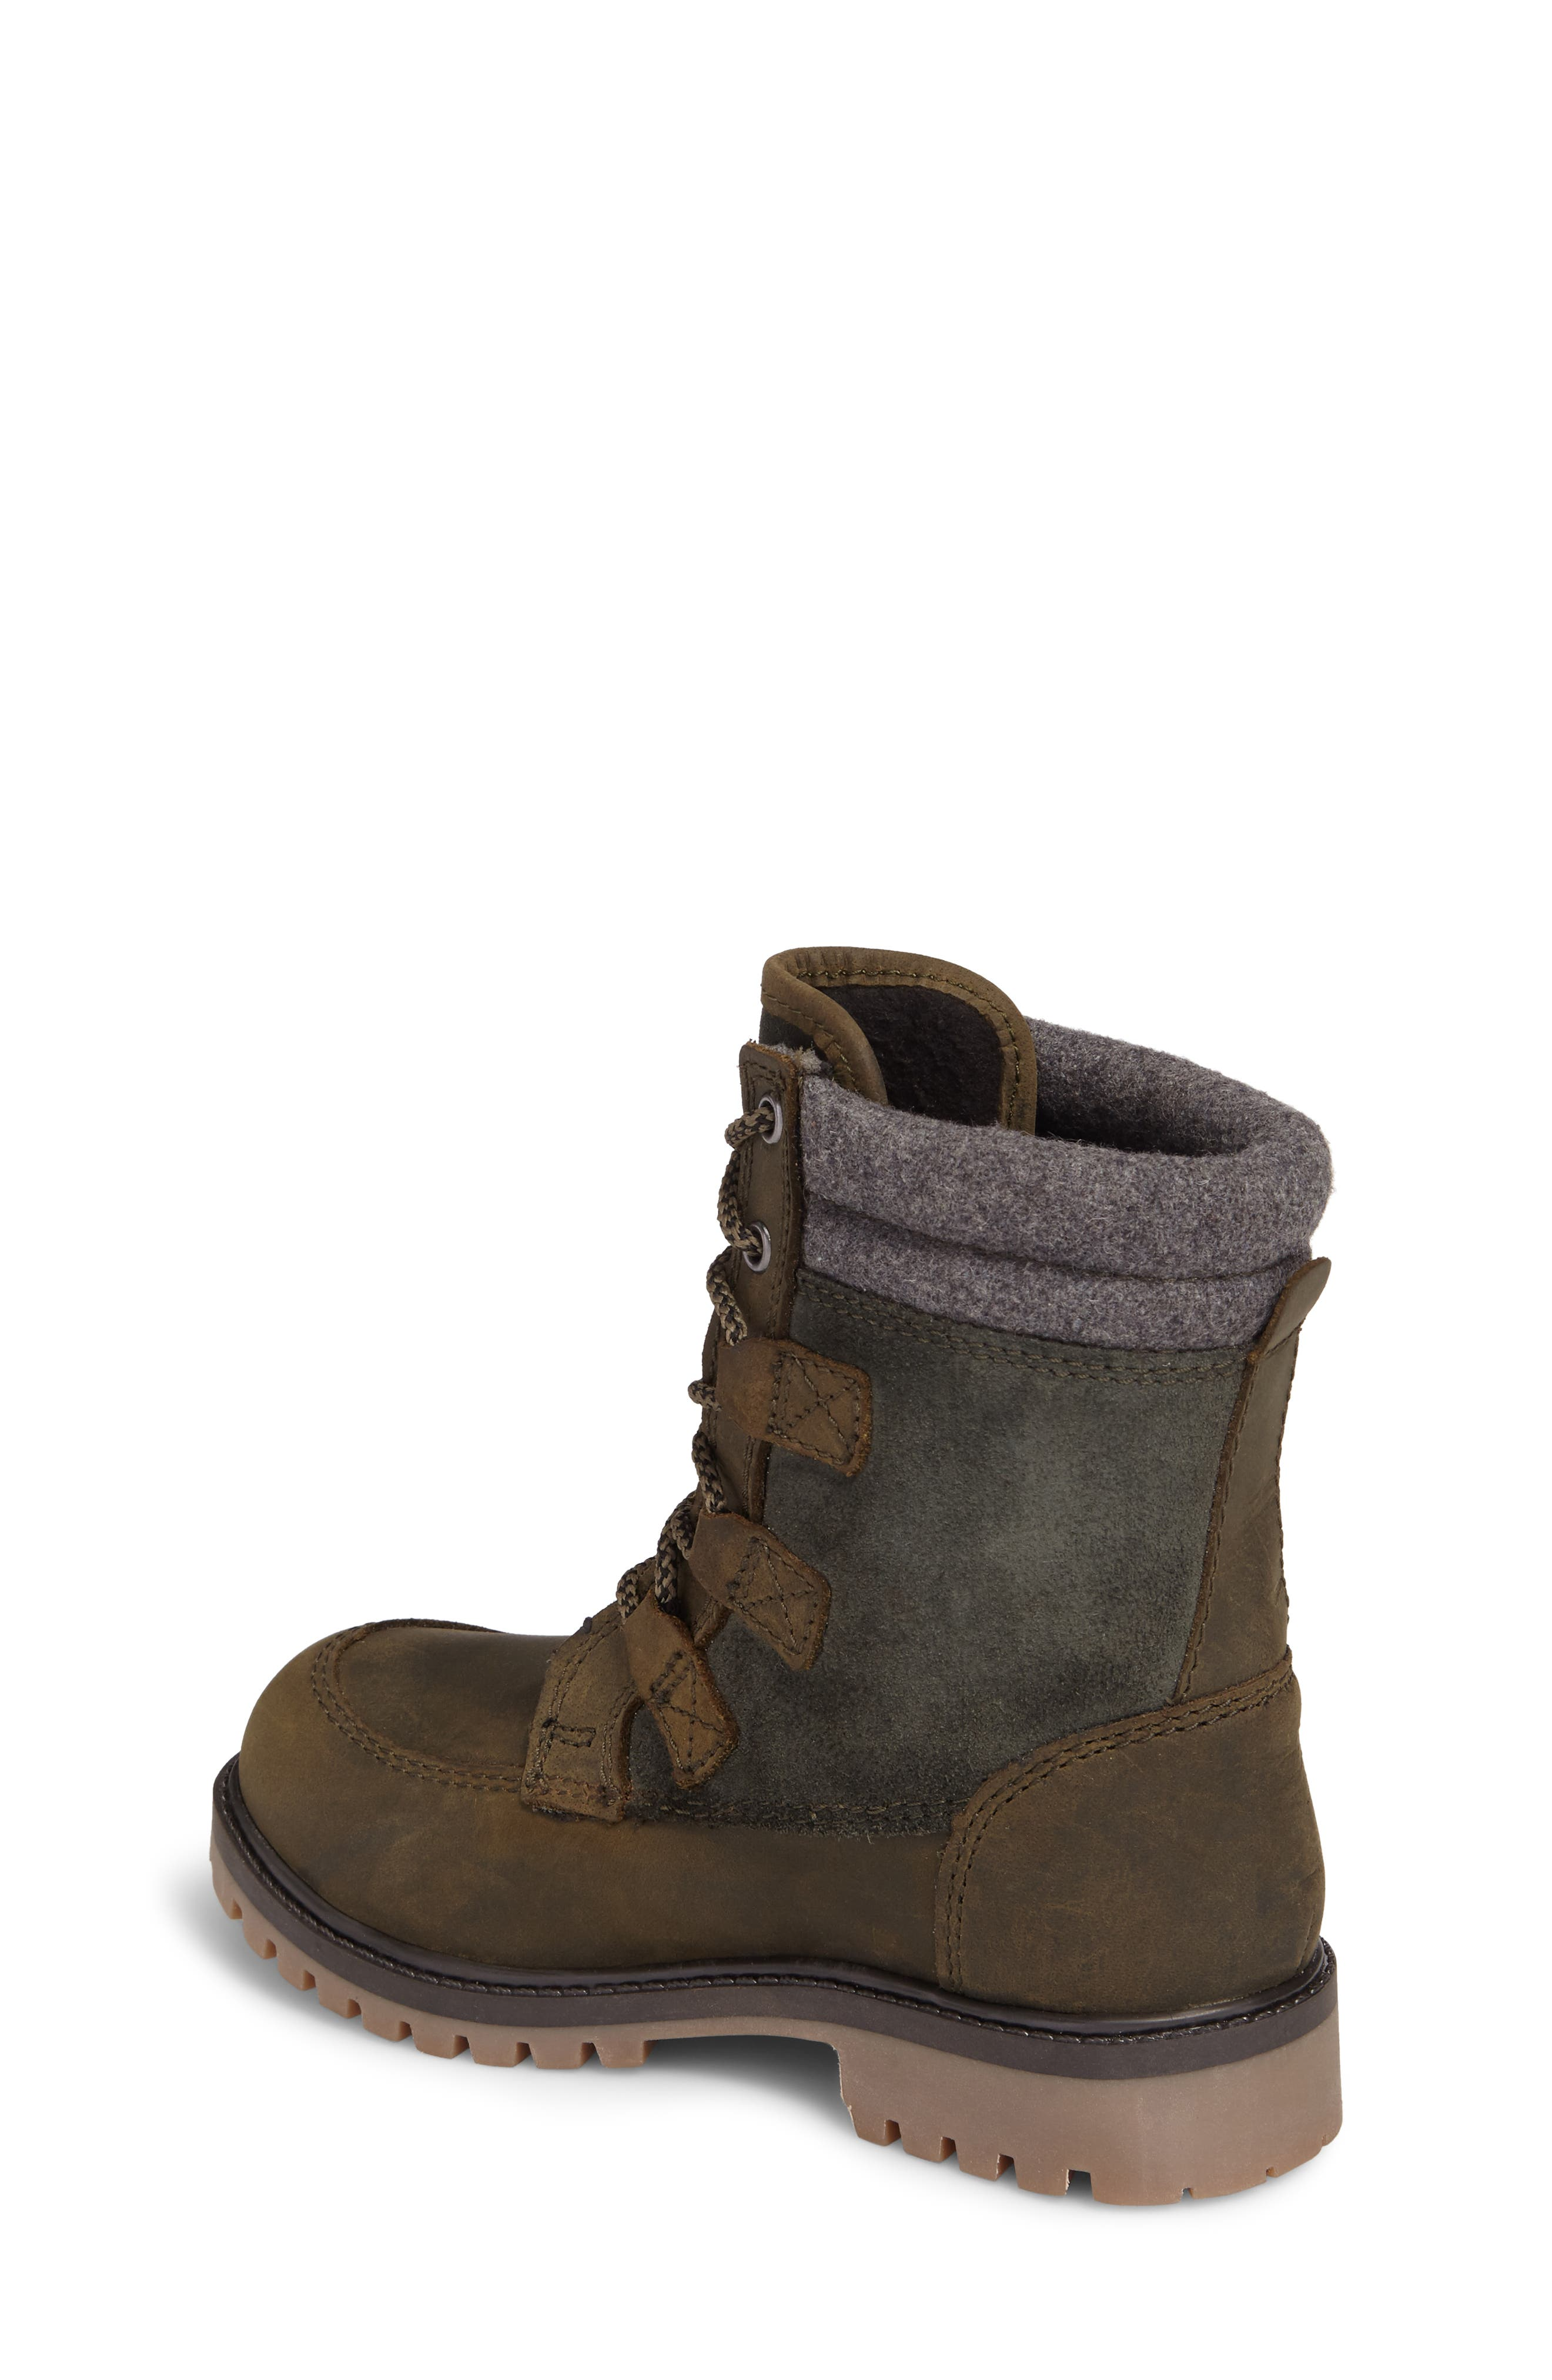 Takodalo Waterproof Boot,                             Alternate thumbnail 2, color,                             Olive